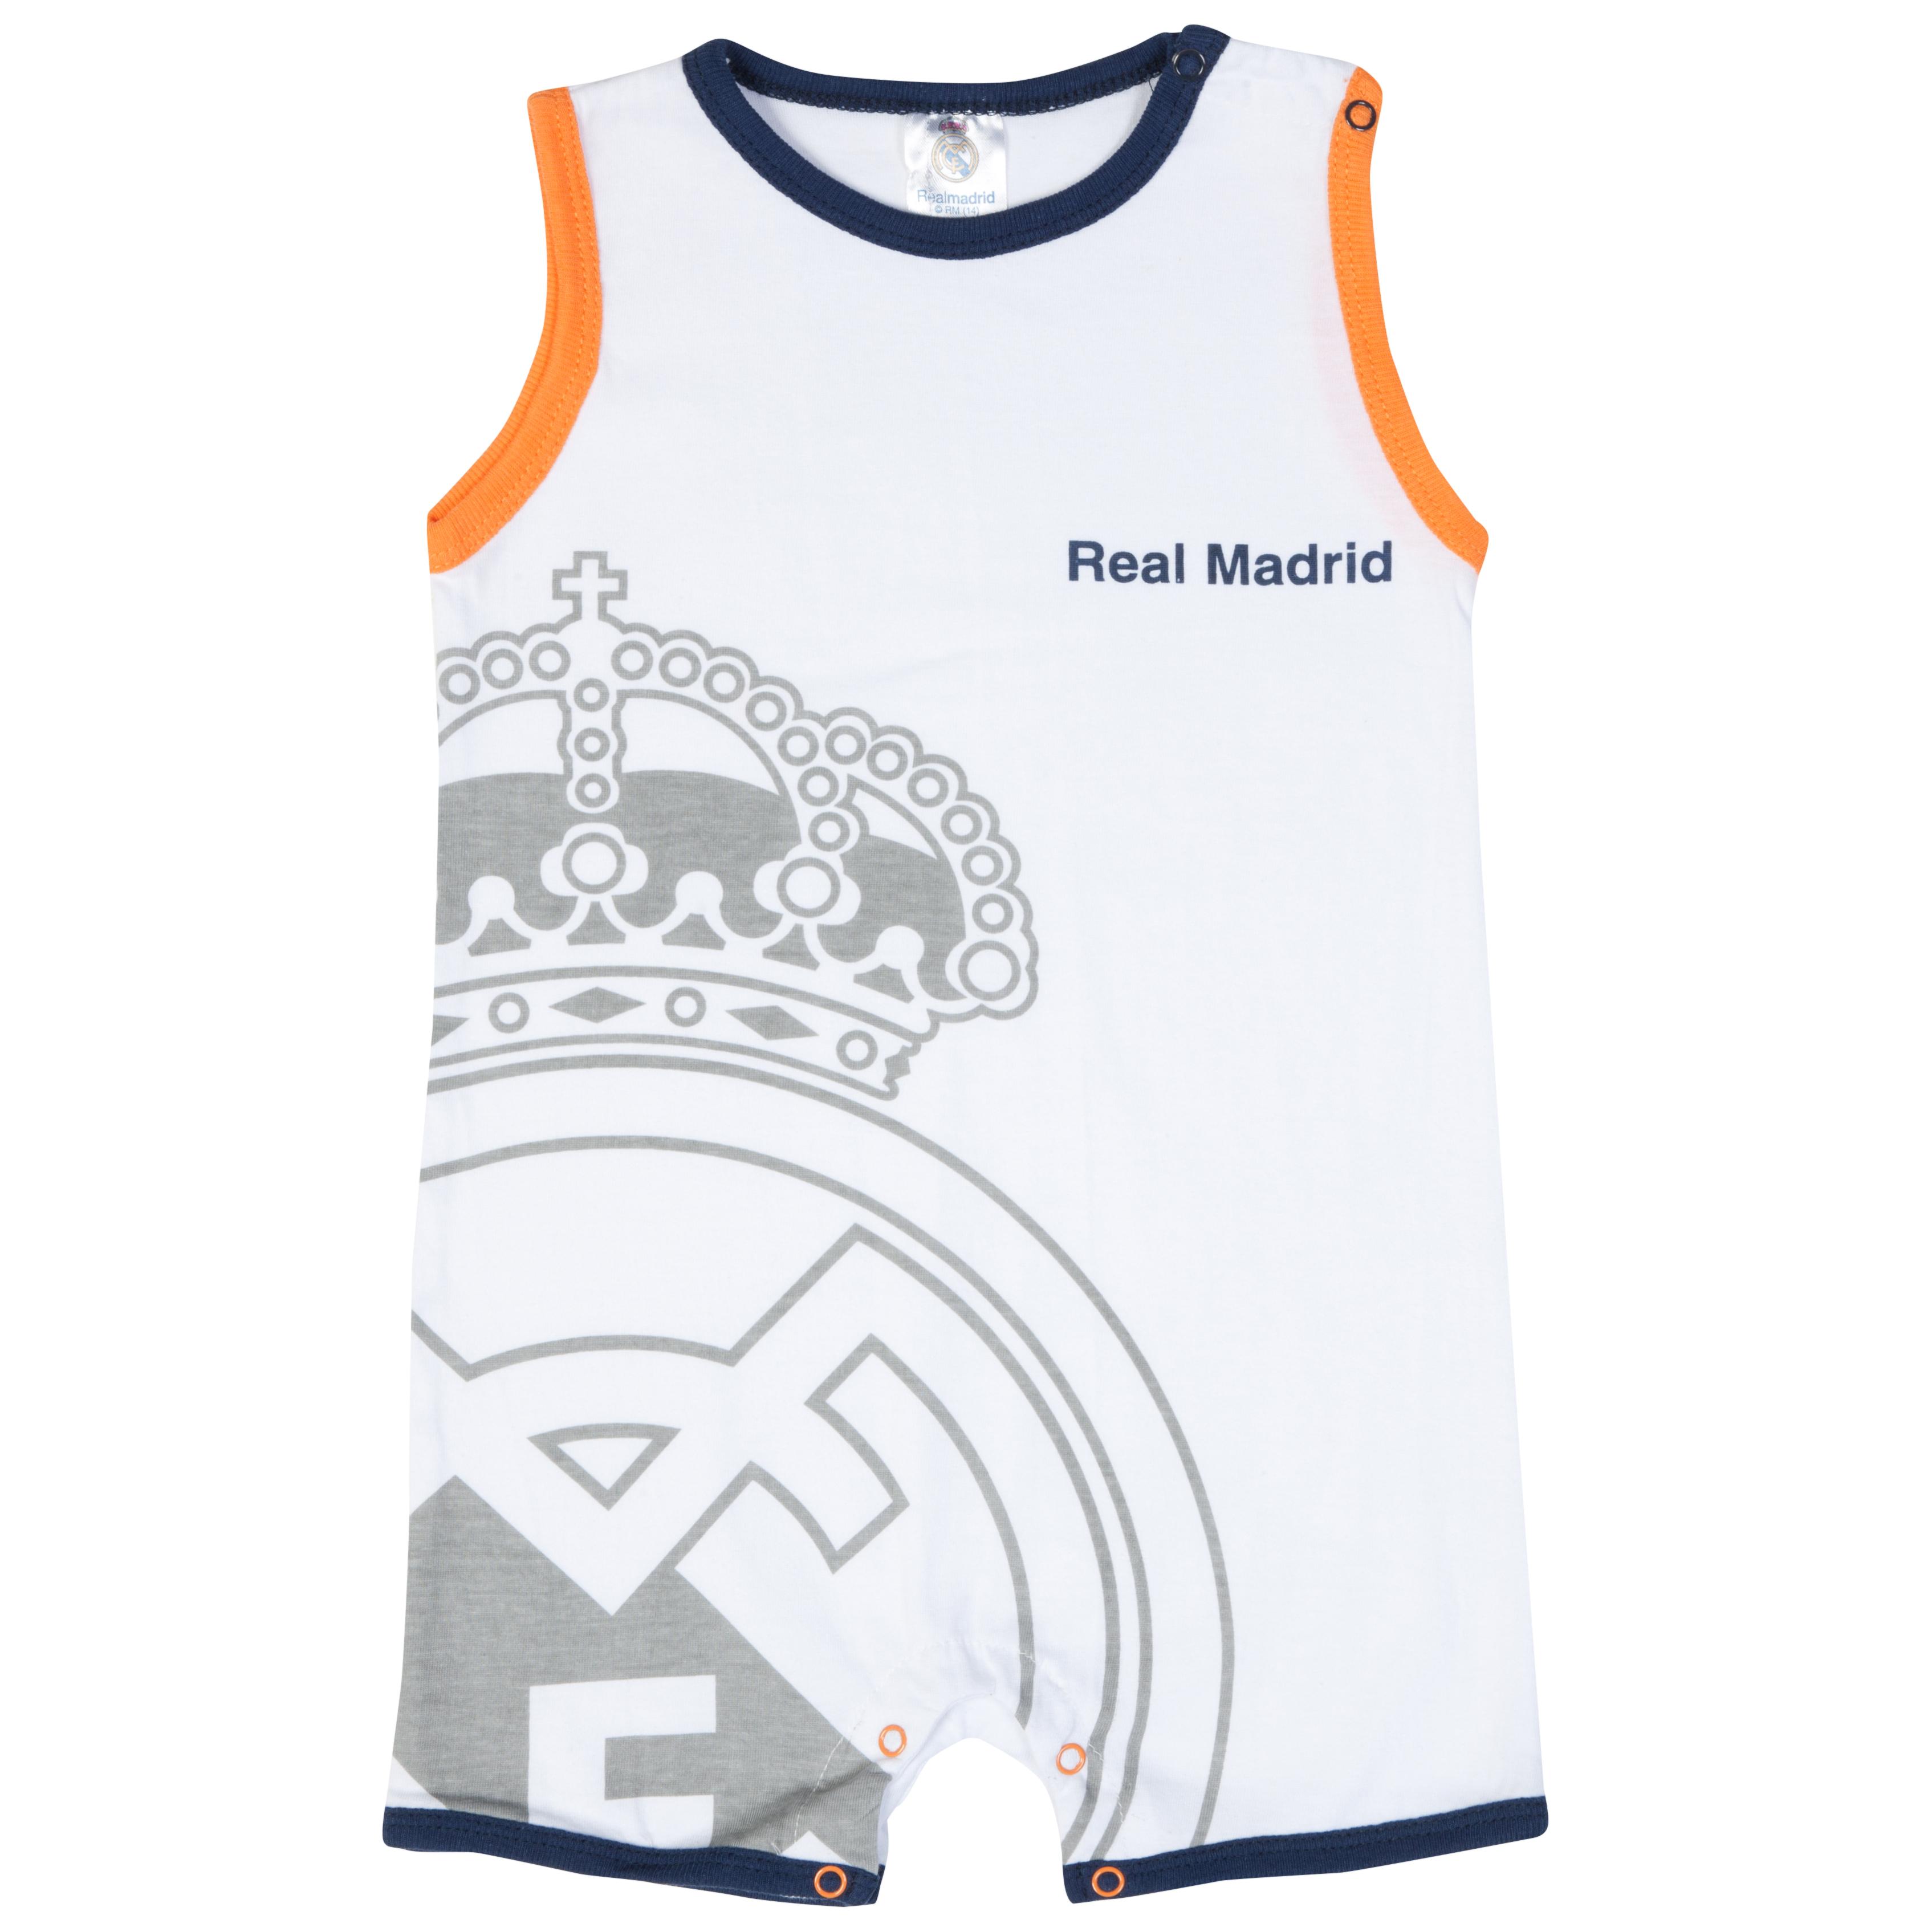 Real Madrid Crest Bodysuit - White - Baby Unisex